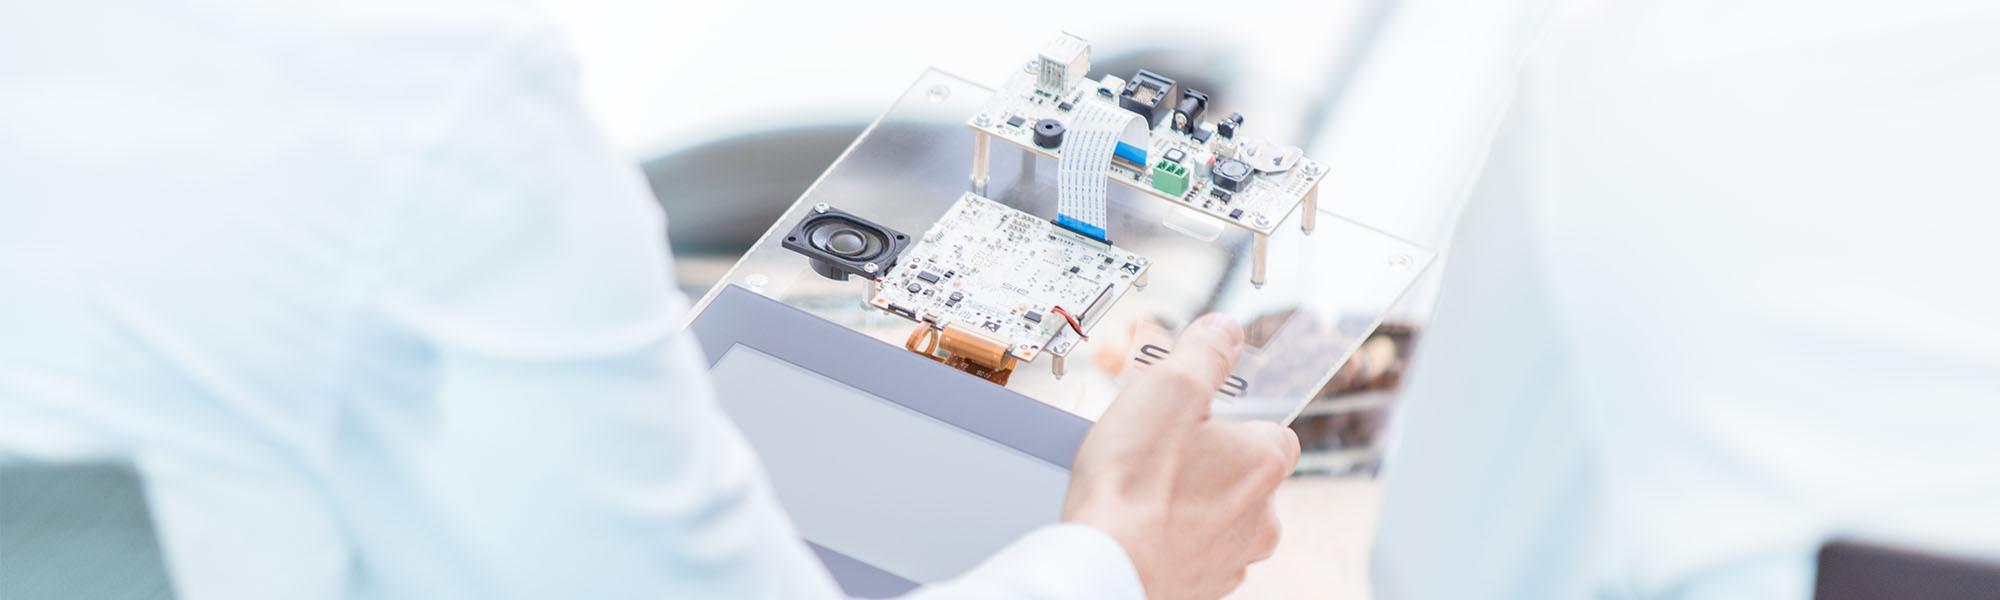 HMI Hardware